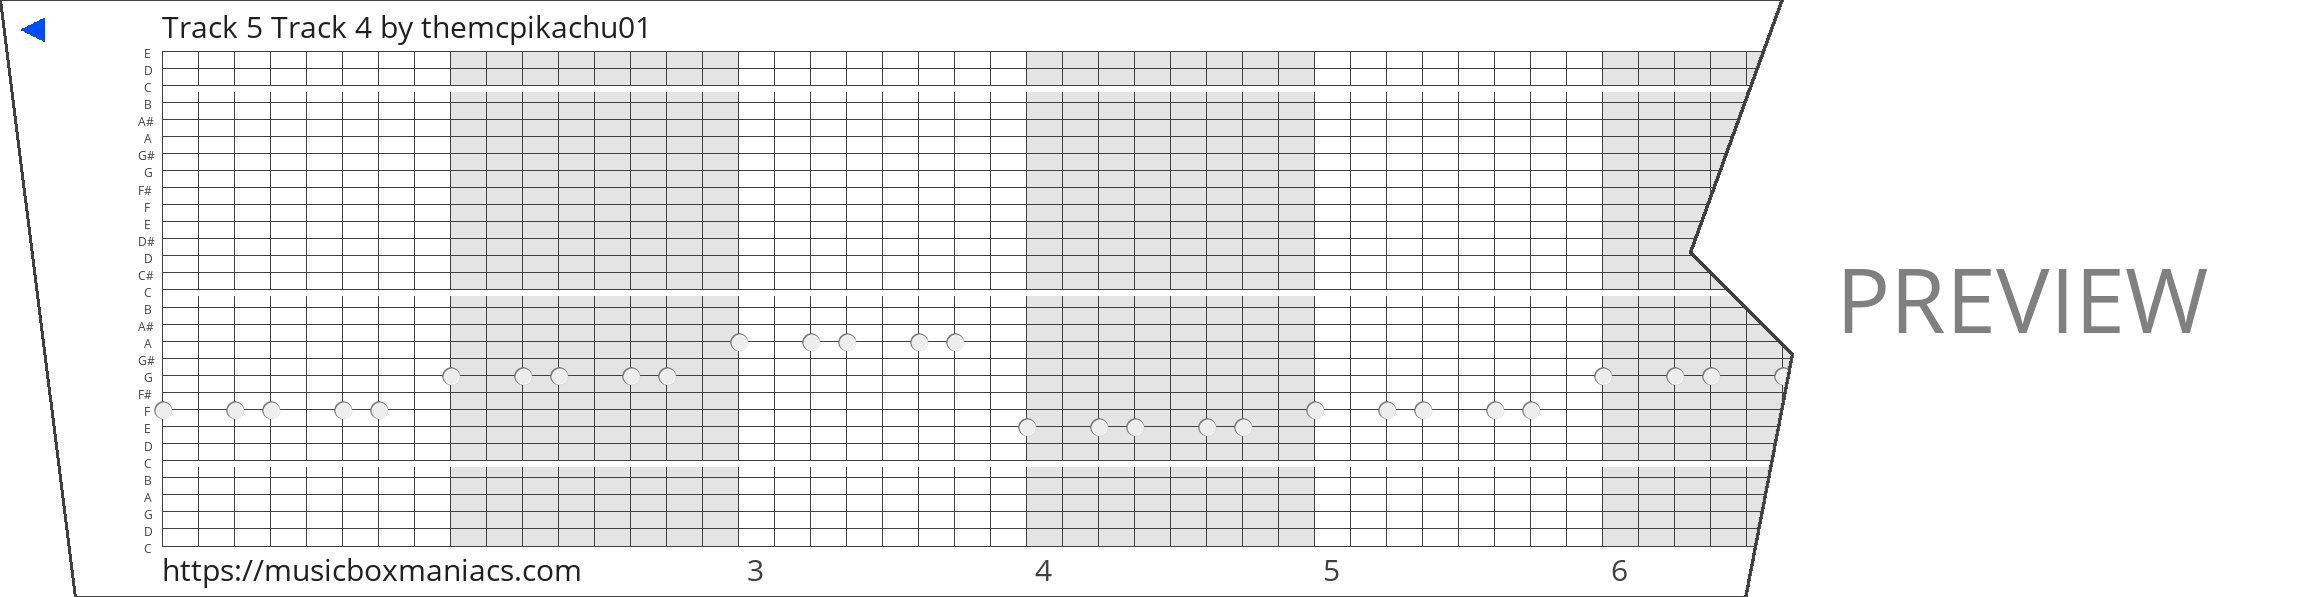 Track 5 Track 4 30 note music box paper strip